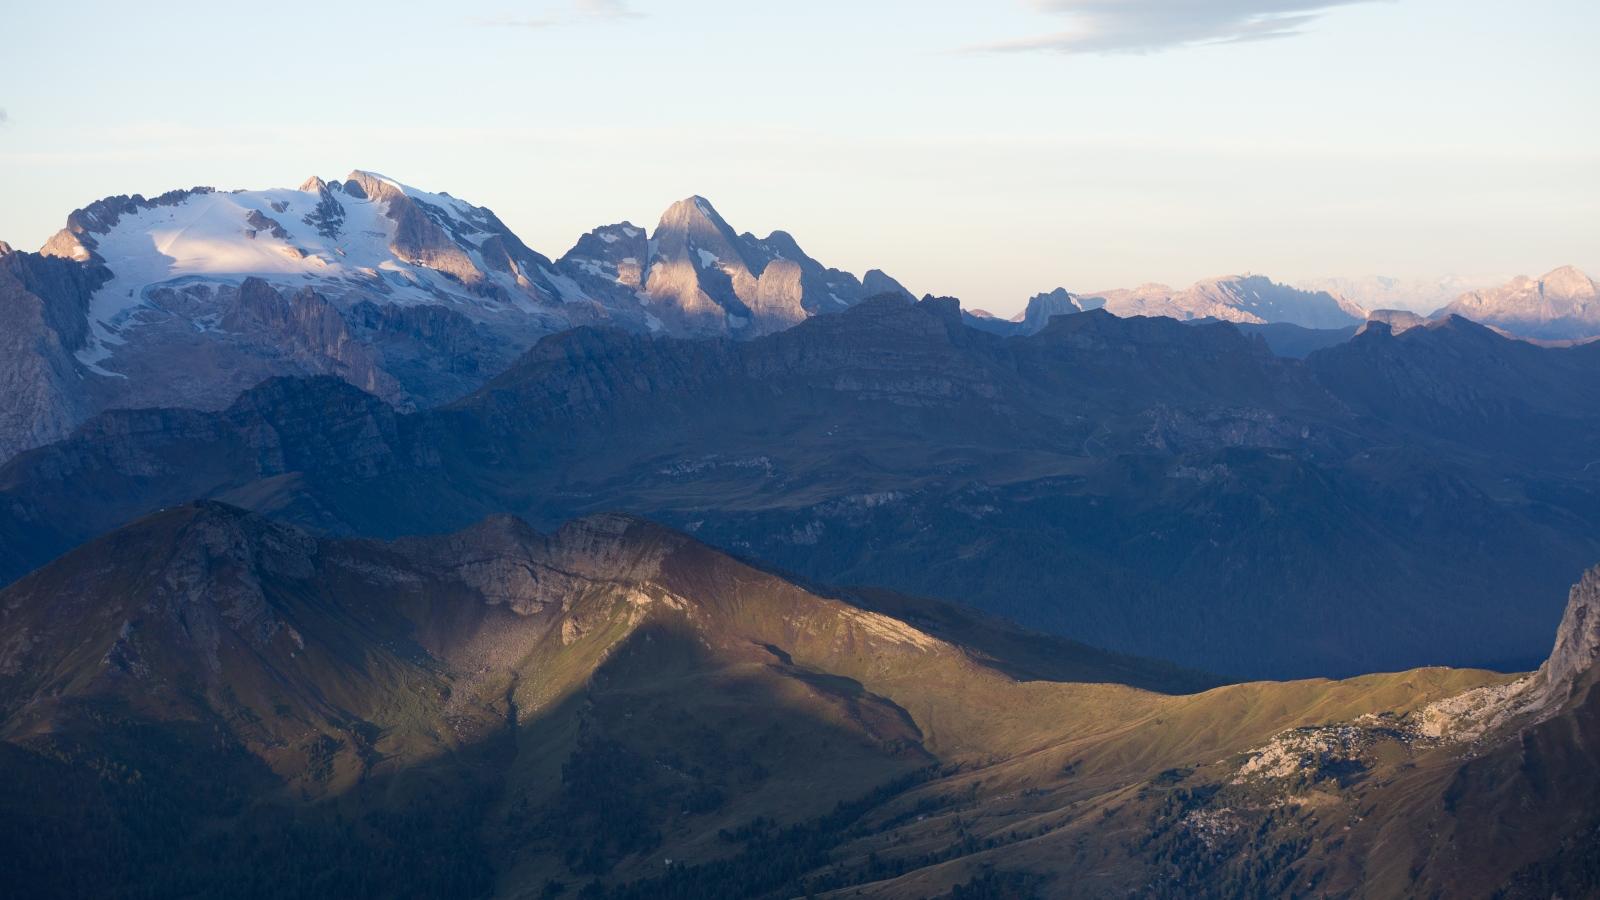 Marmolado Sunrise Sunrise higlights the higest peak in the Dolomites.